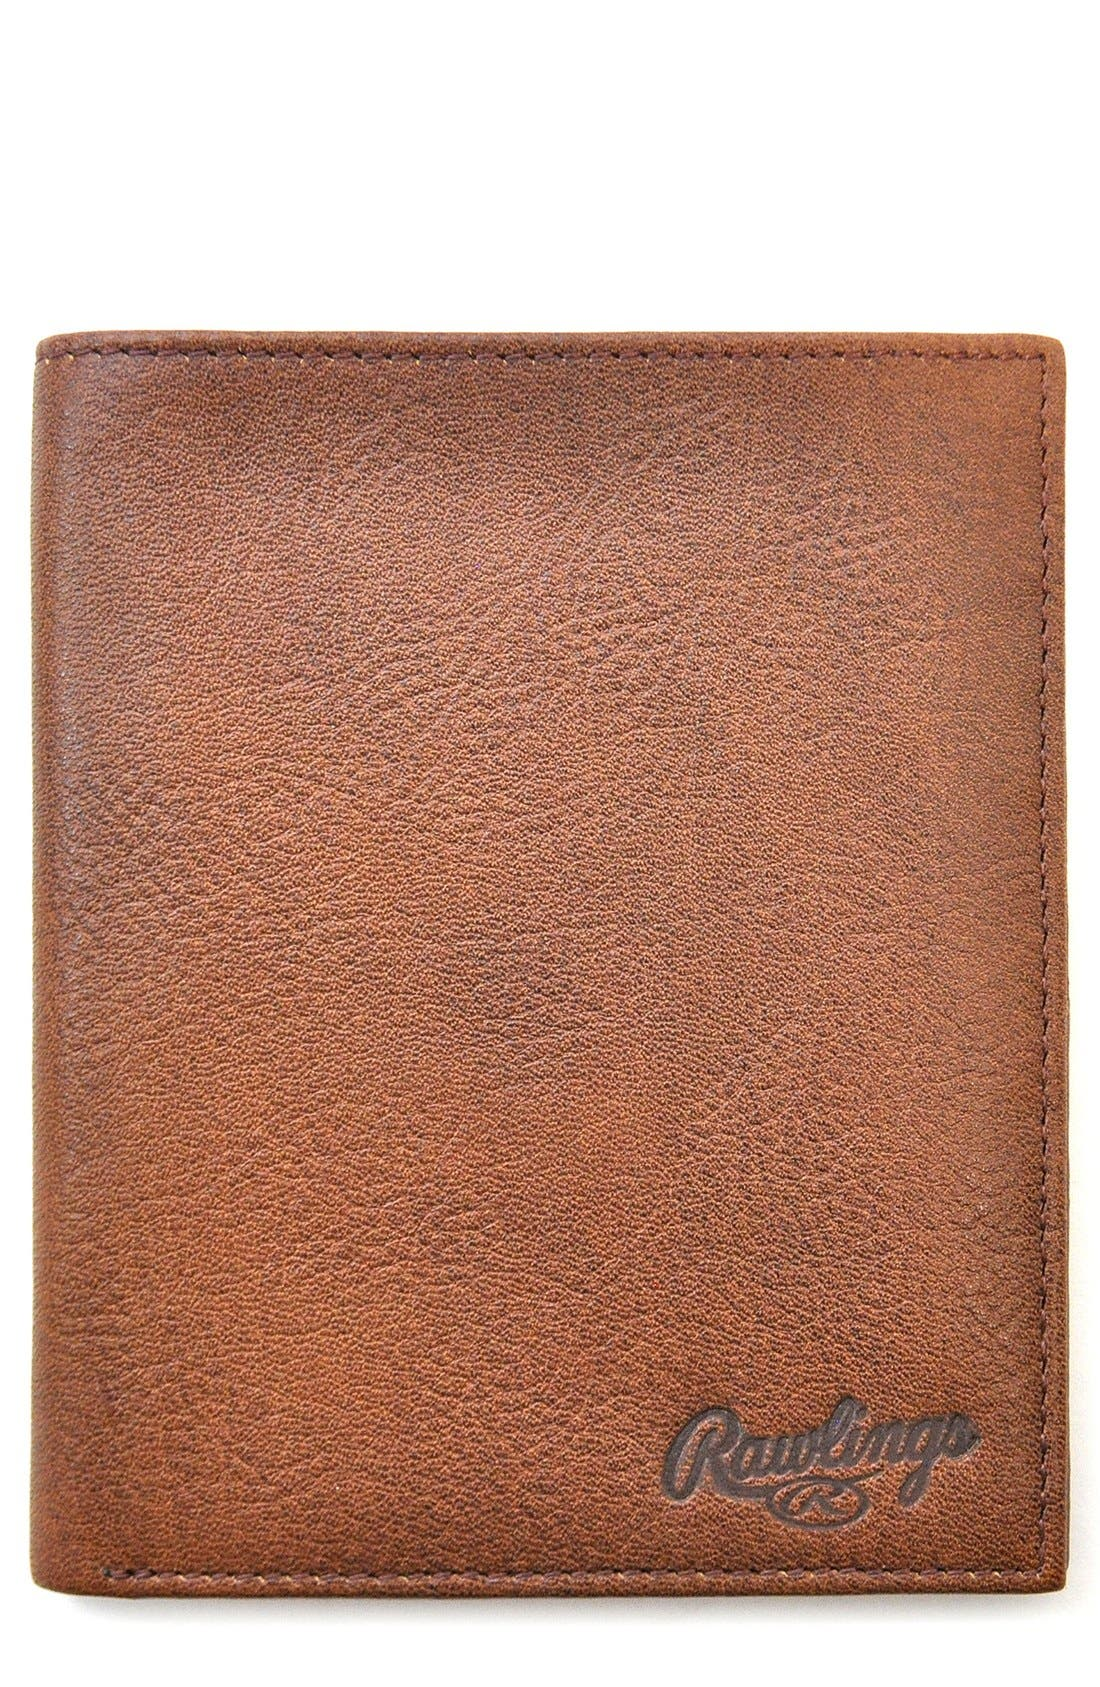 Triple Play Leather Executive Wallet,                         Main,                         color, Cognac